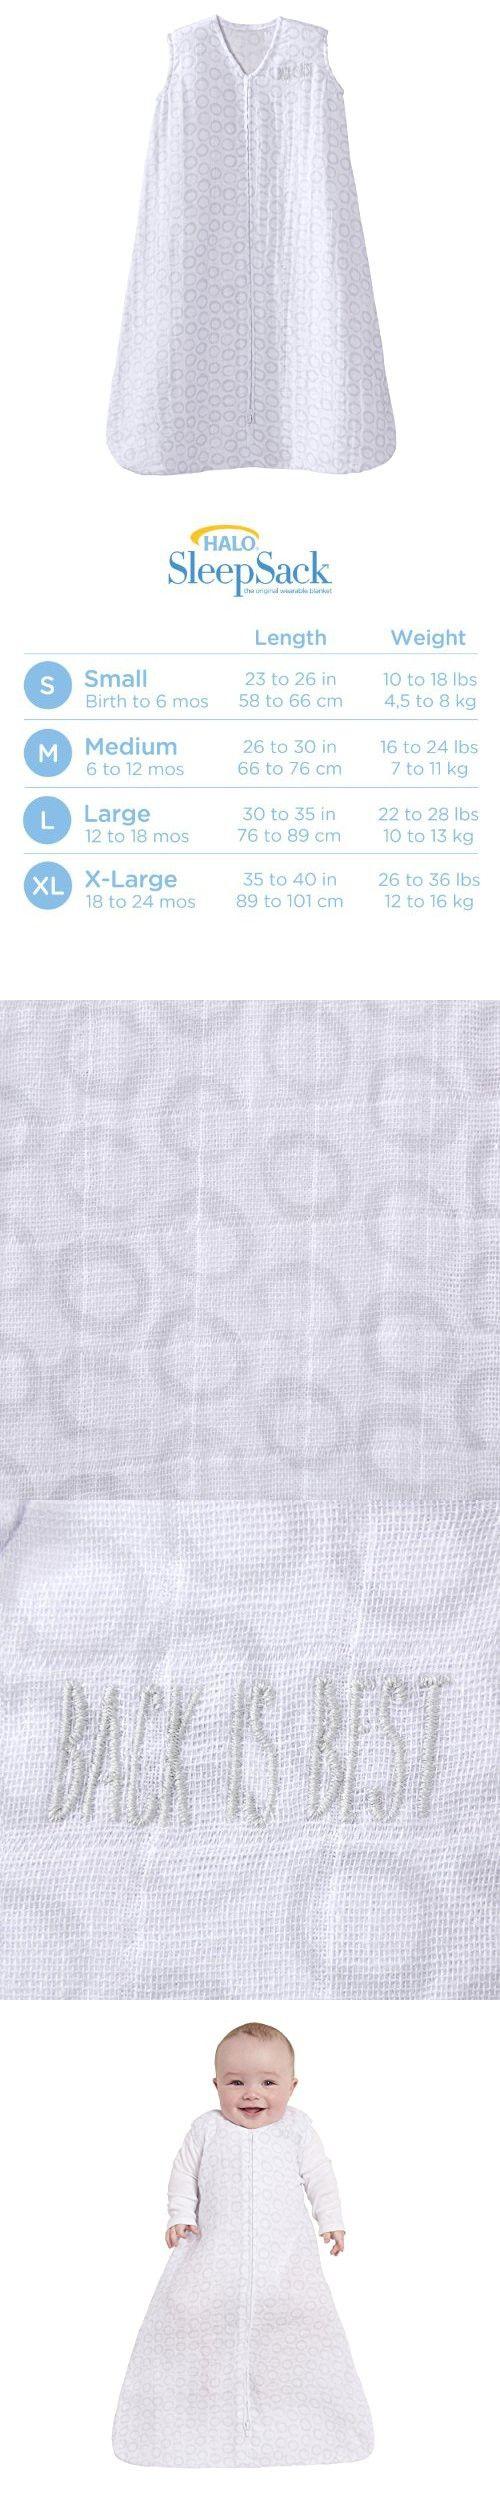 Halo 100% Cotton Muslin SleepSack Wearable Blanket, Circles Grey, Small